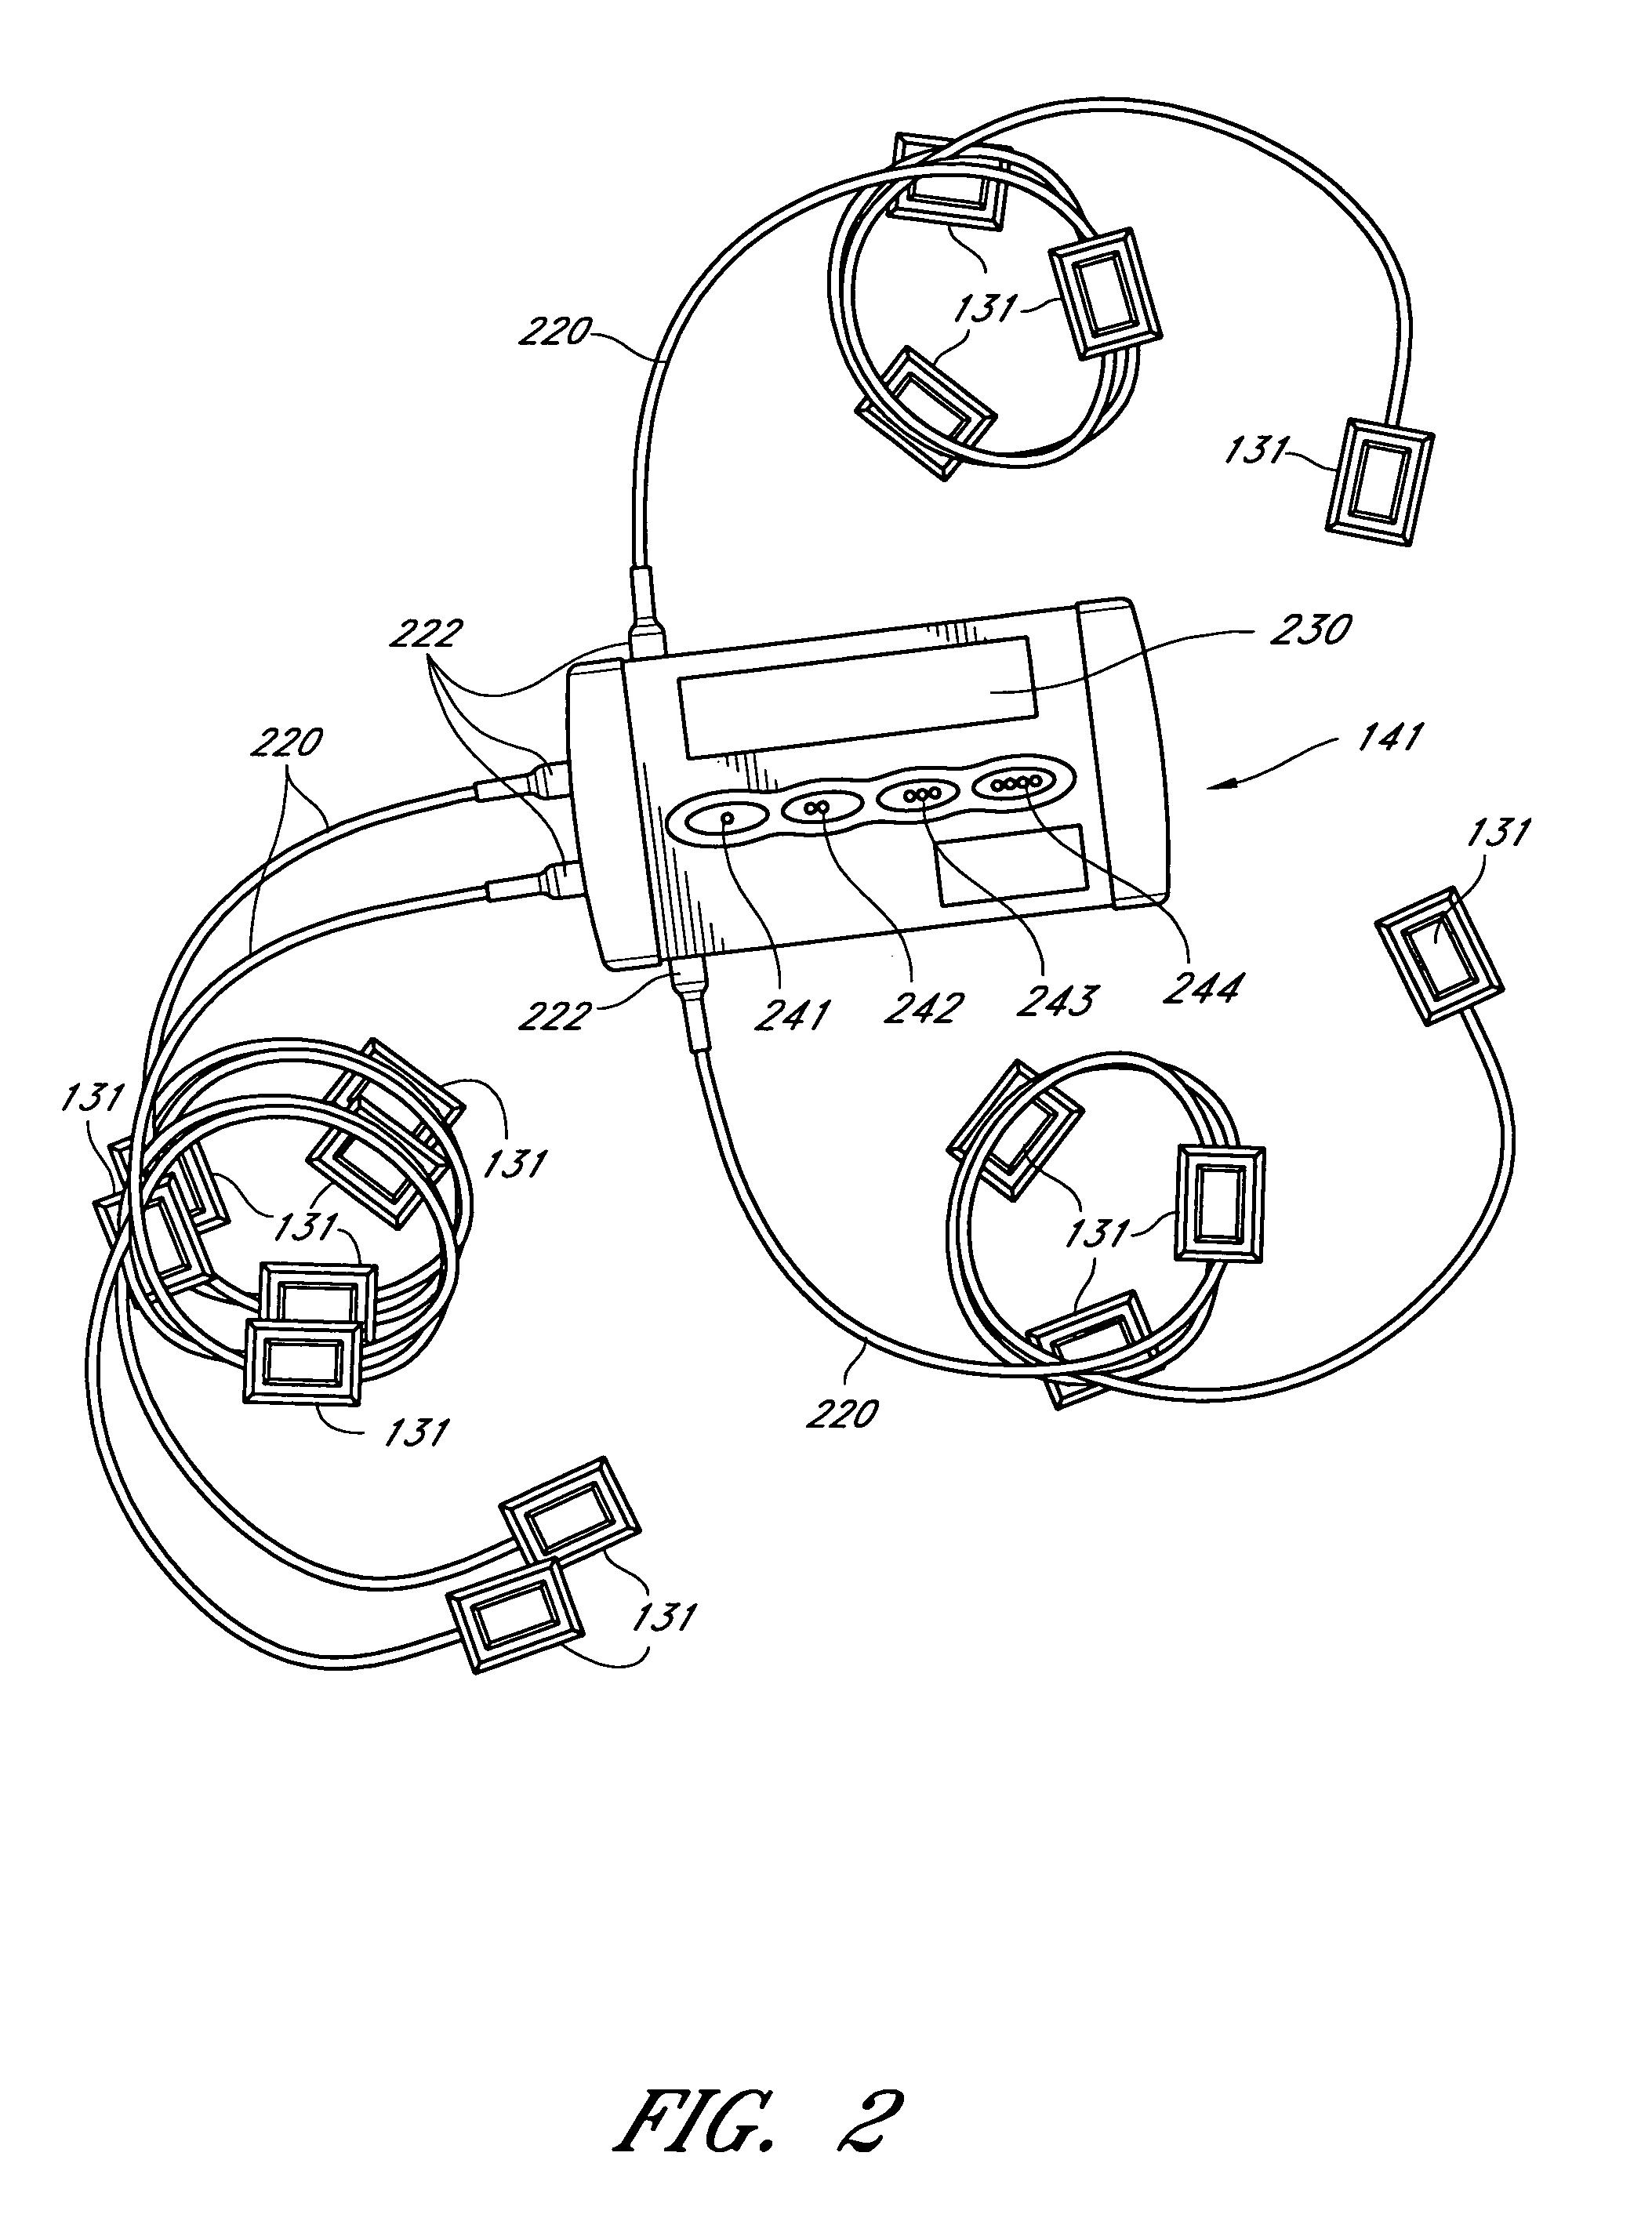 2301 honda h engine diagram patent us 7 602 301 b1  patent us 7 602 301 b1